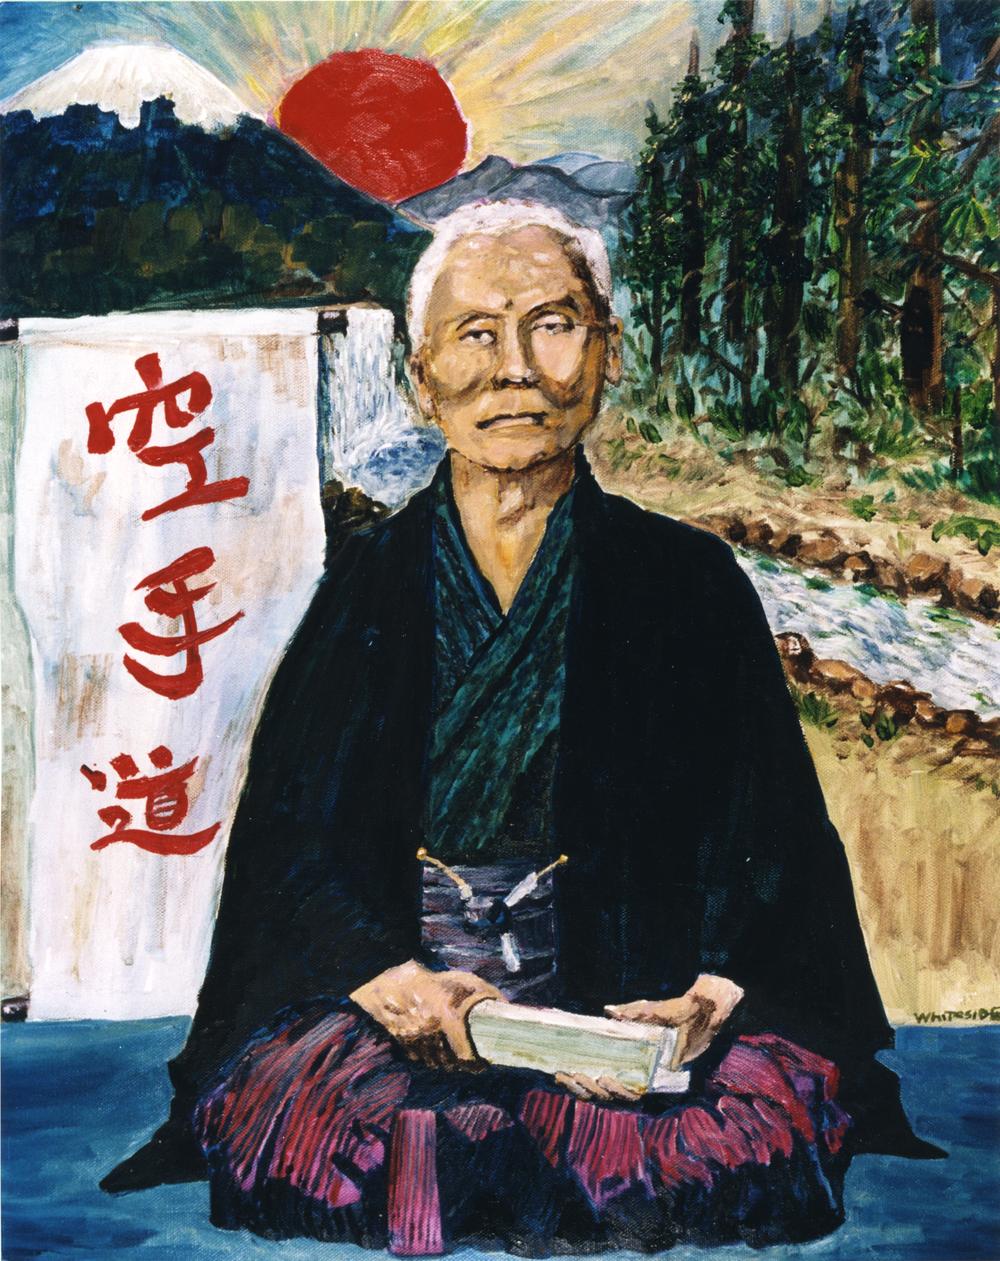 funakoshi by mwhiteside.png